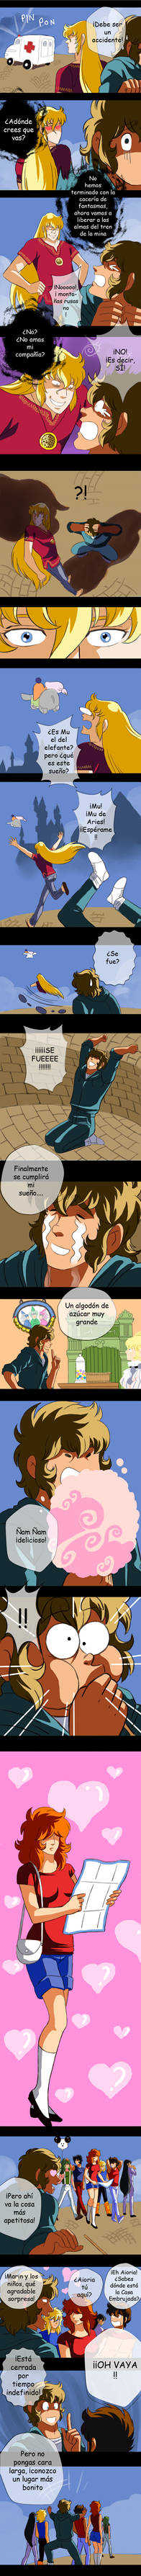 saintseiya parodie 12 part 6 (SPANISH) by kori